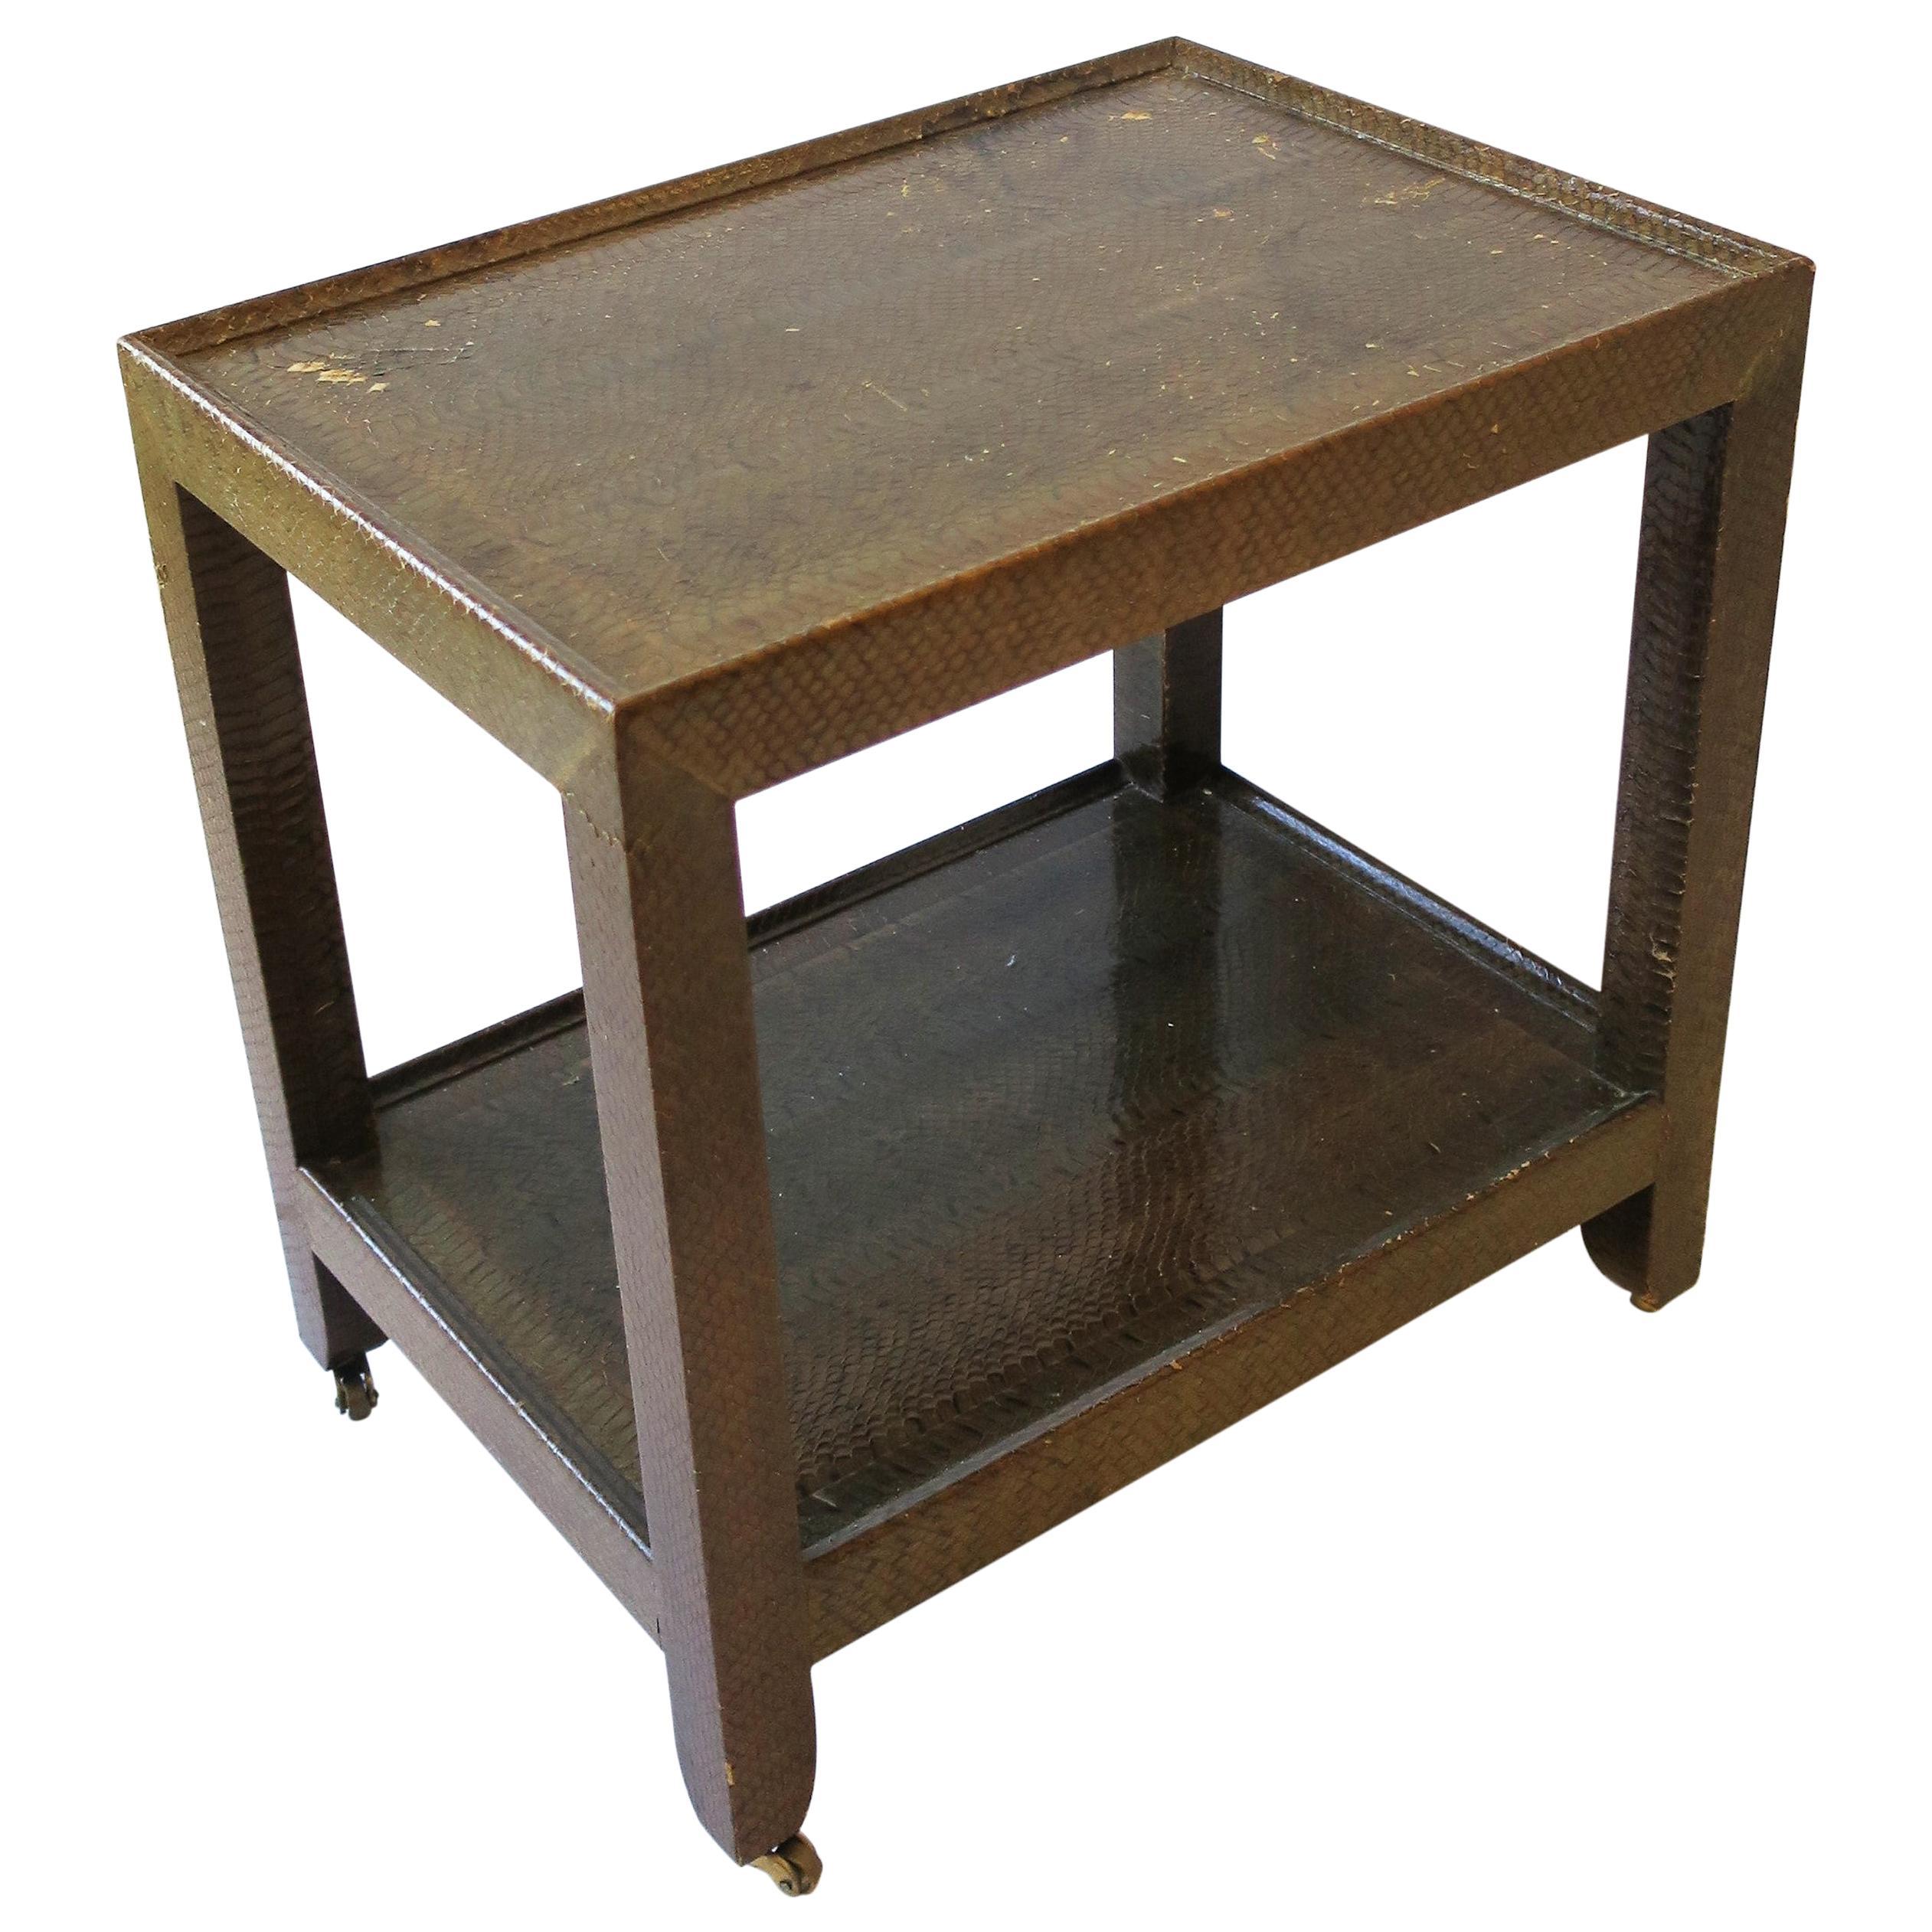 Karl Springer Postmodern Snakeskin and Brass Telephone Side or End Table, 1990